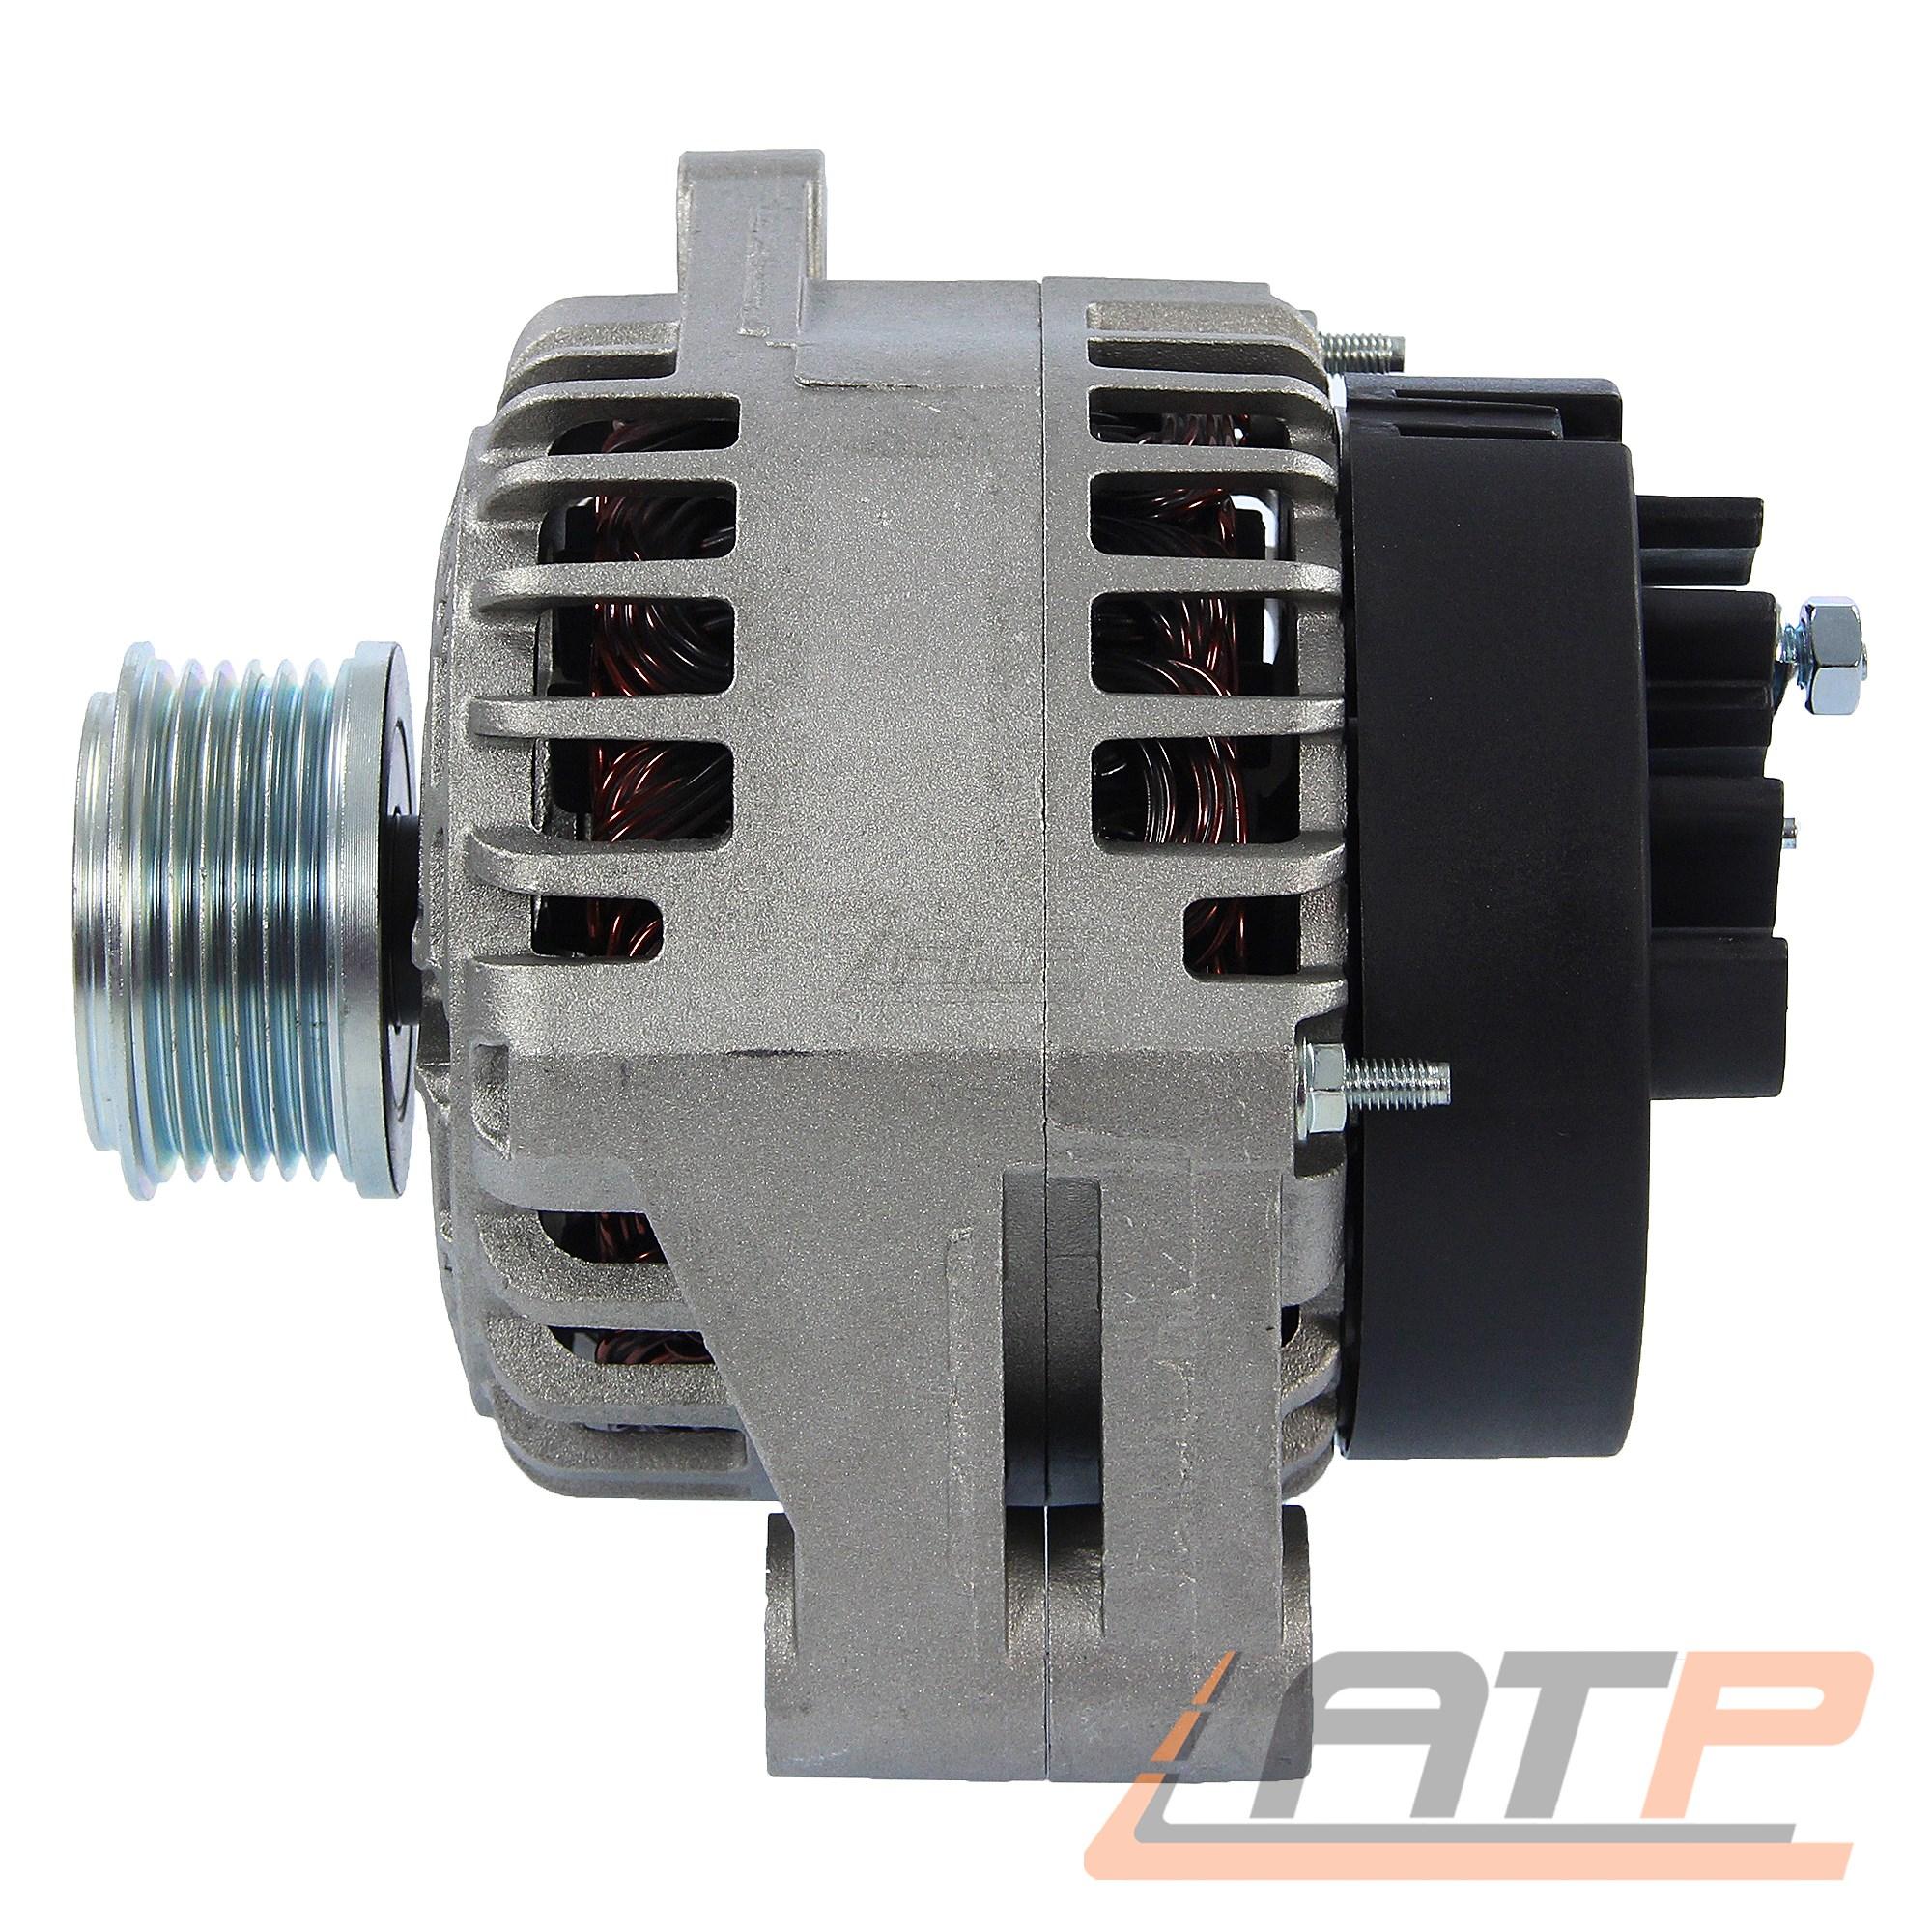 LICHTMASCHINE GENERATOR 140-A FIAT GRANDE PUNTO 199 1.6 D Multijet BJ AB 08